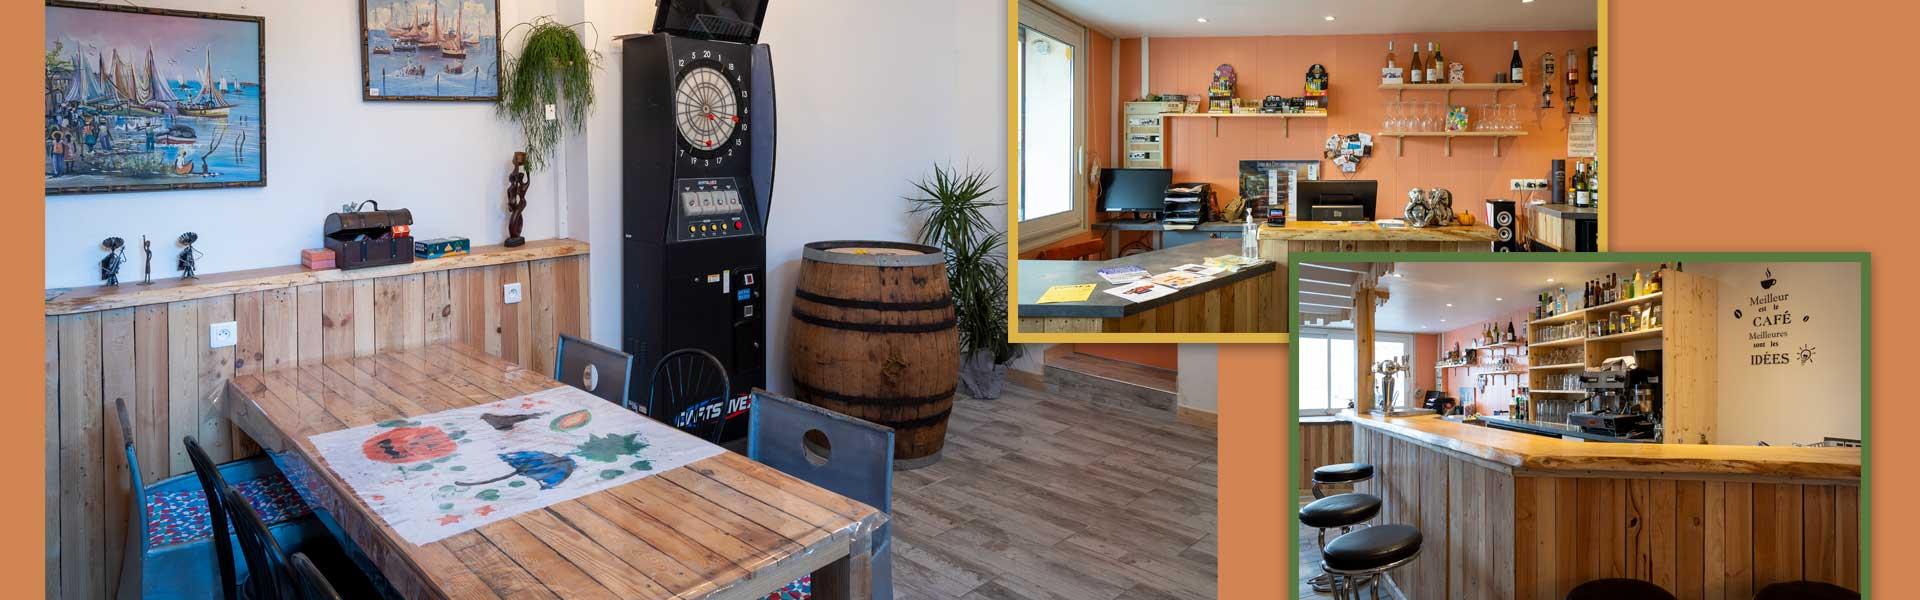 Permalink to: Bar, café à Saint-Sauvant (17)